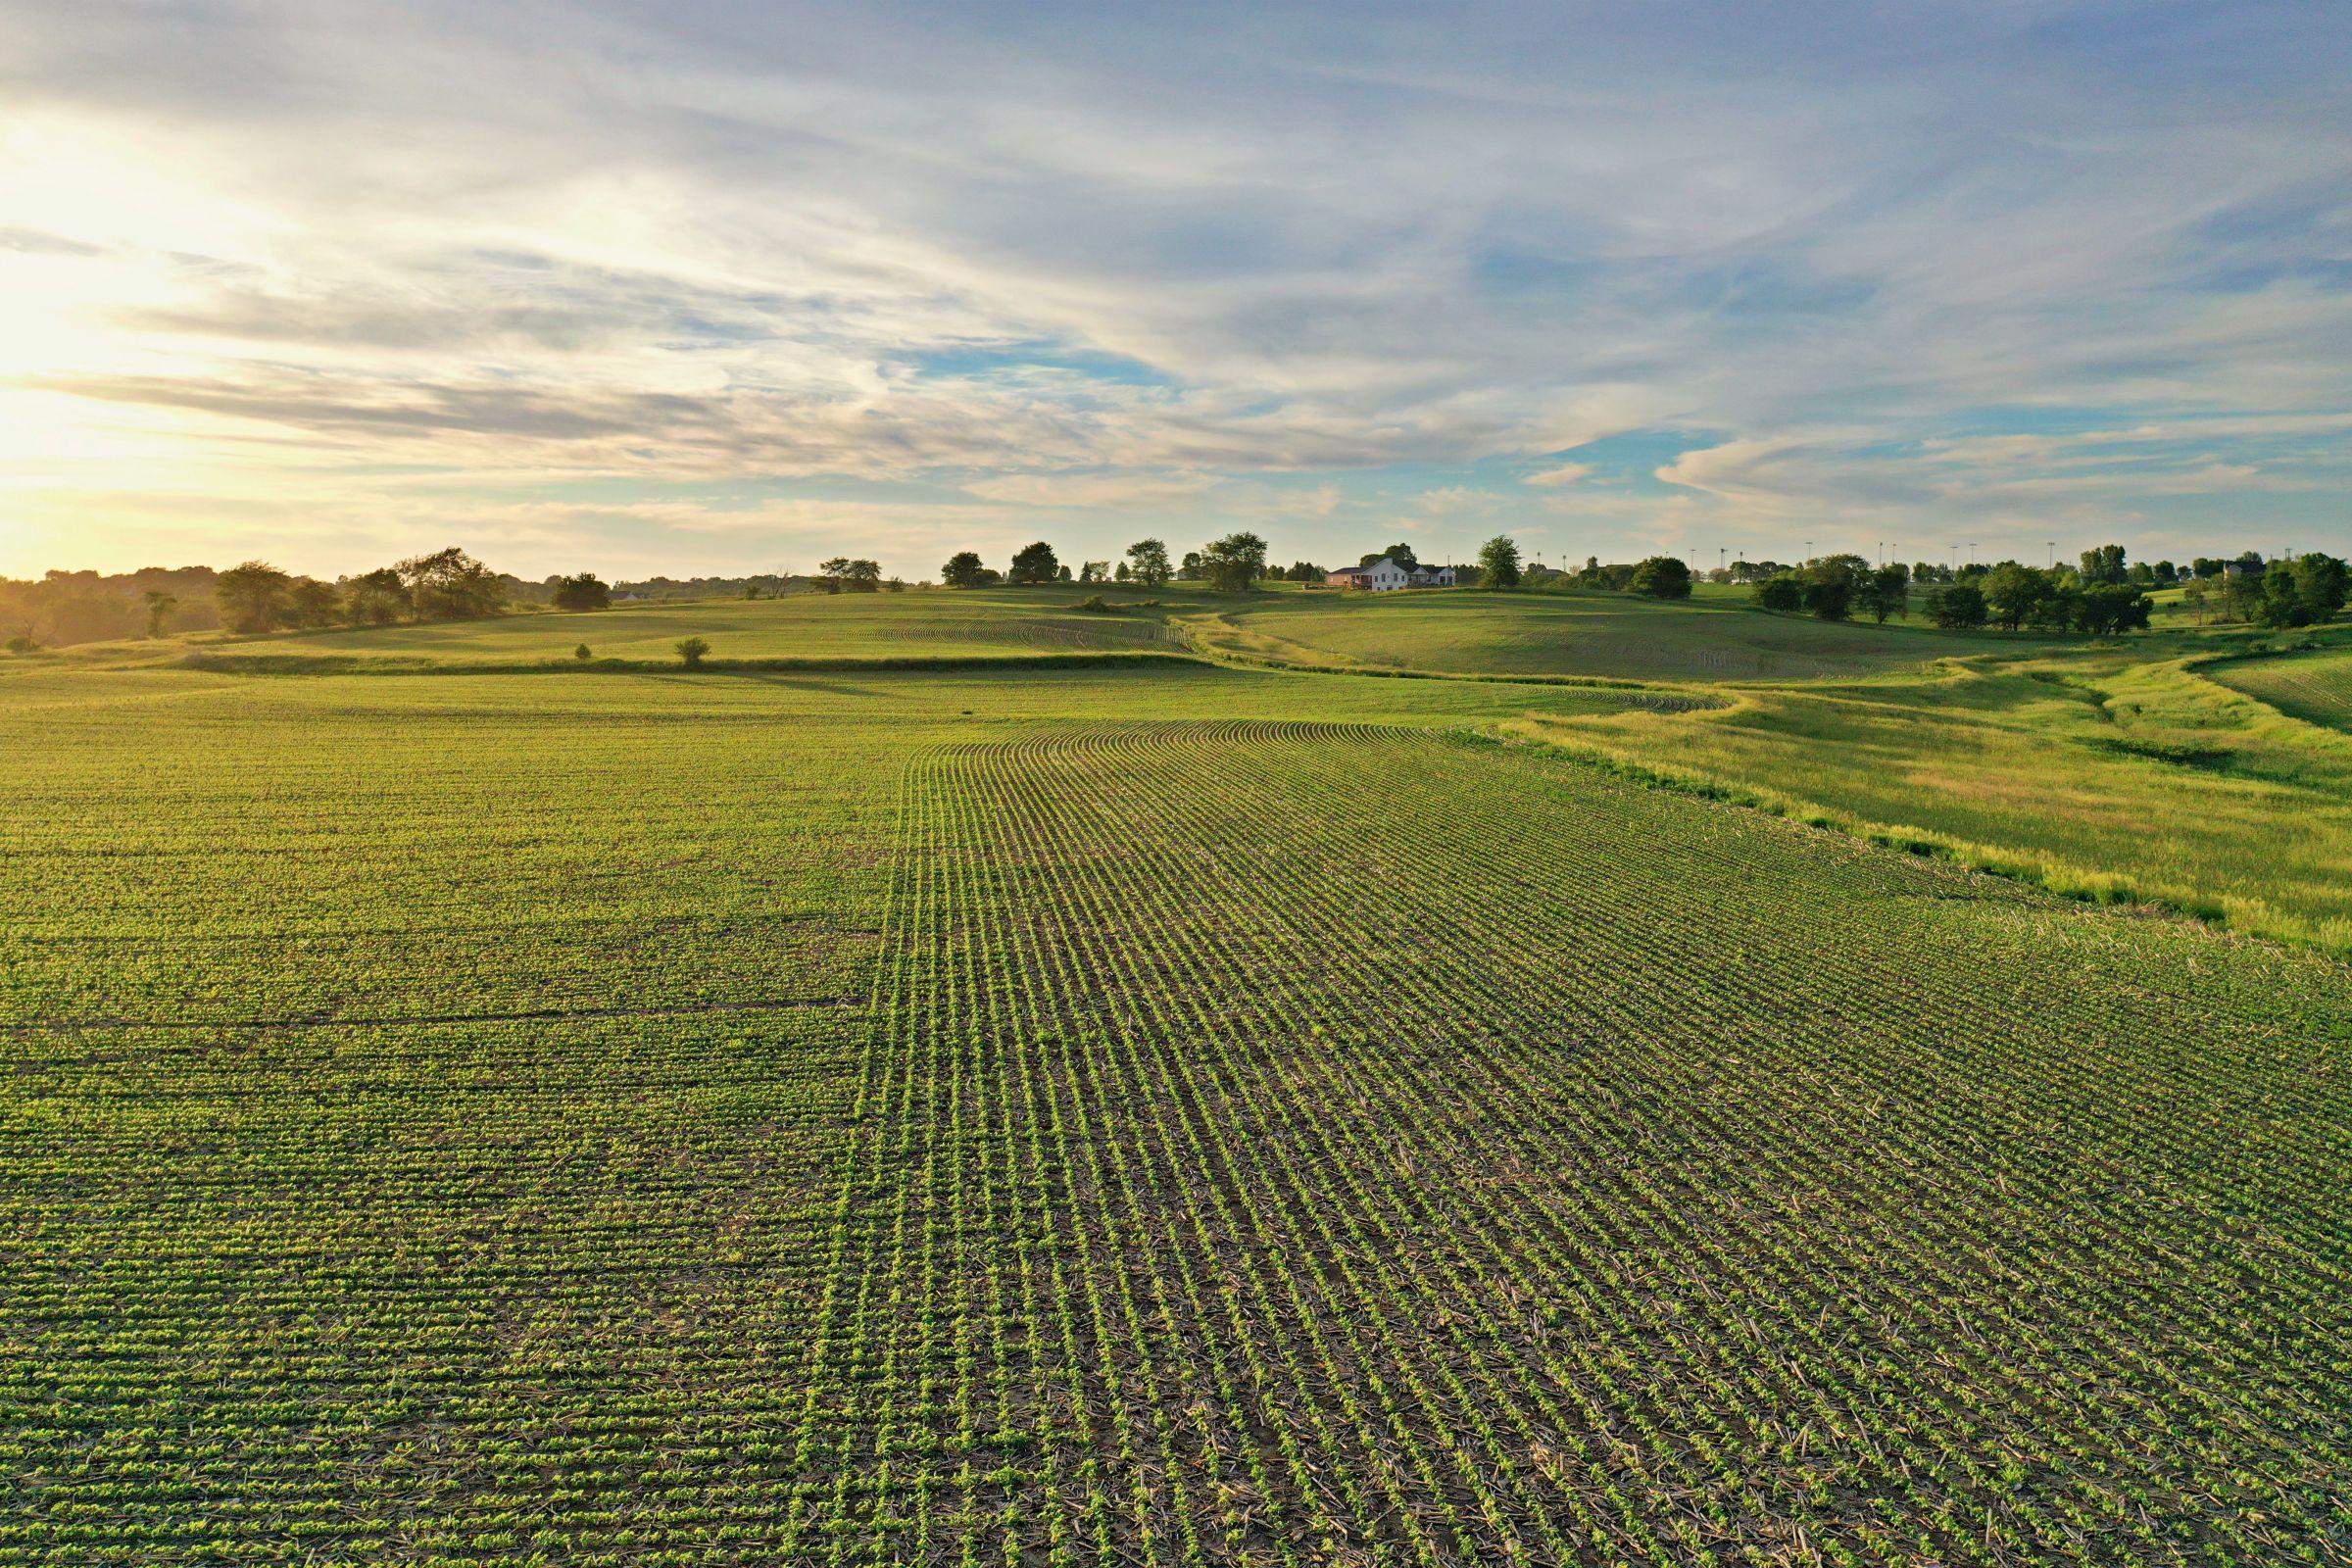 land-warren-county-iowa-80-acres-listing-number-15328-5-2021-01-25-192213.JPG